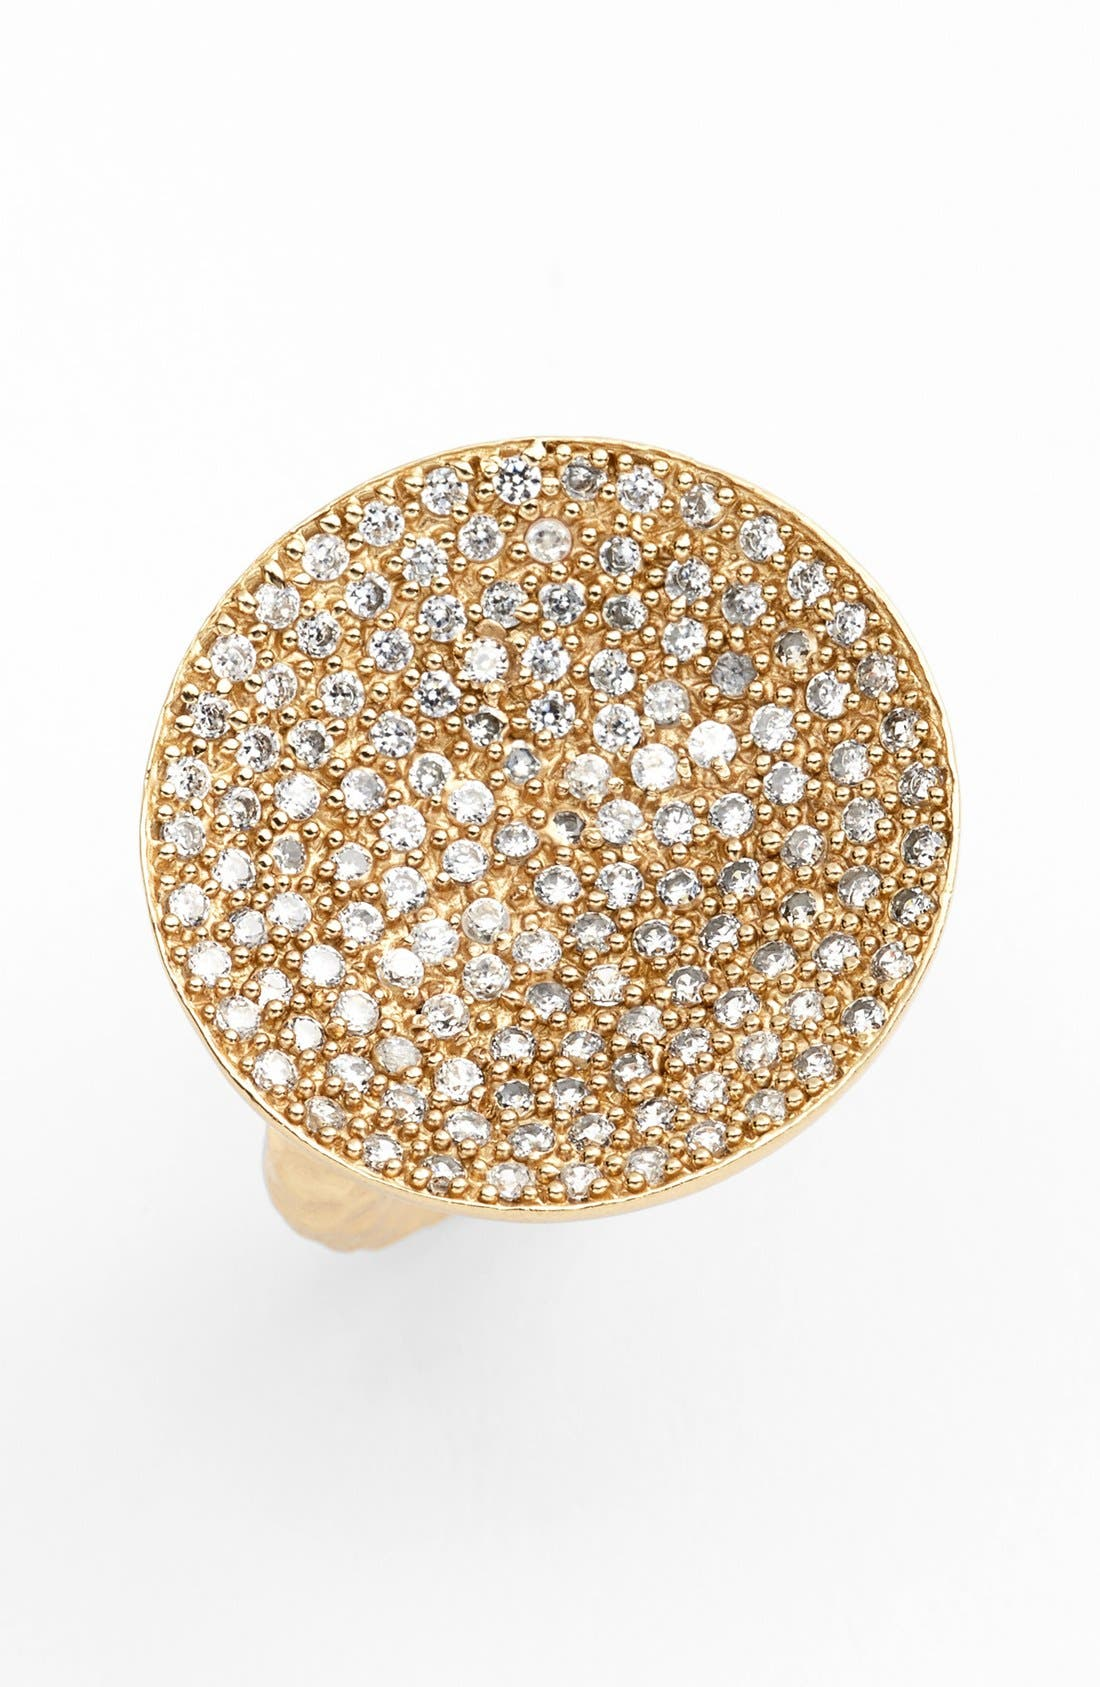 Main Image - Melinda Maria 'Nicole' Cocktail Ring